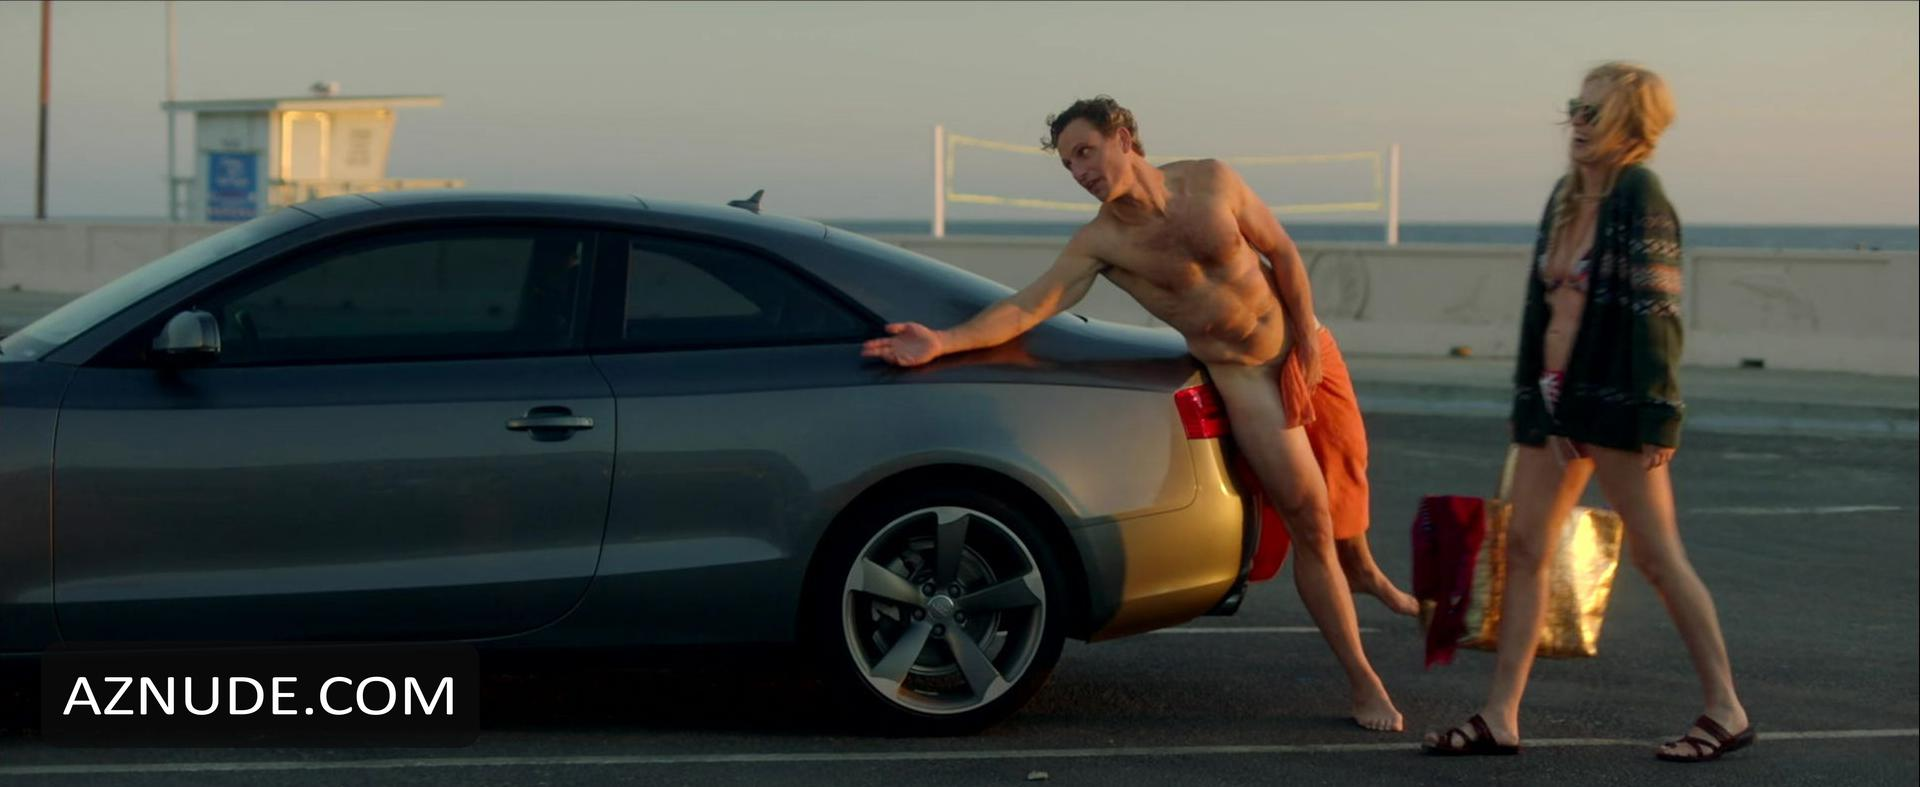 Celebrity nude scenes regret, actresses nudity clauses